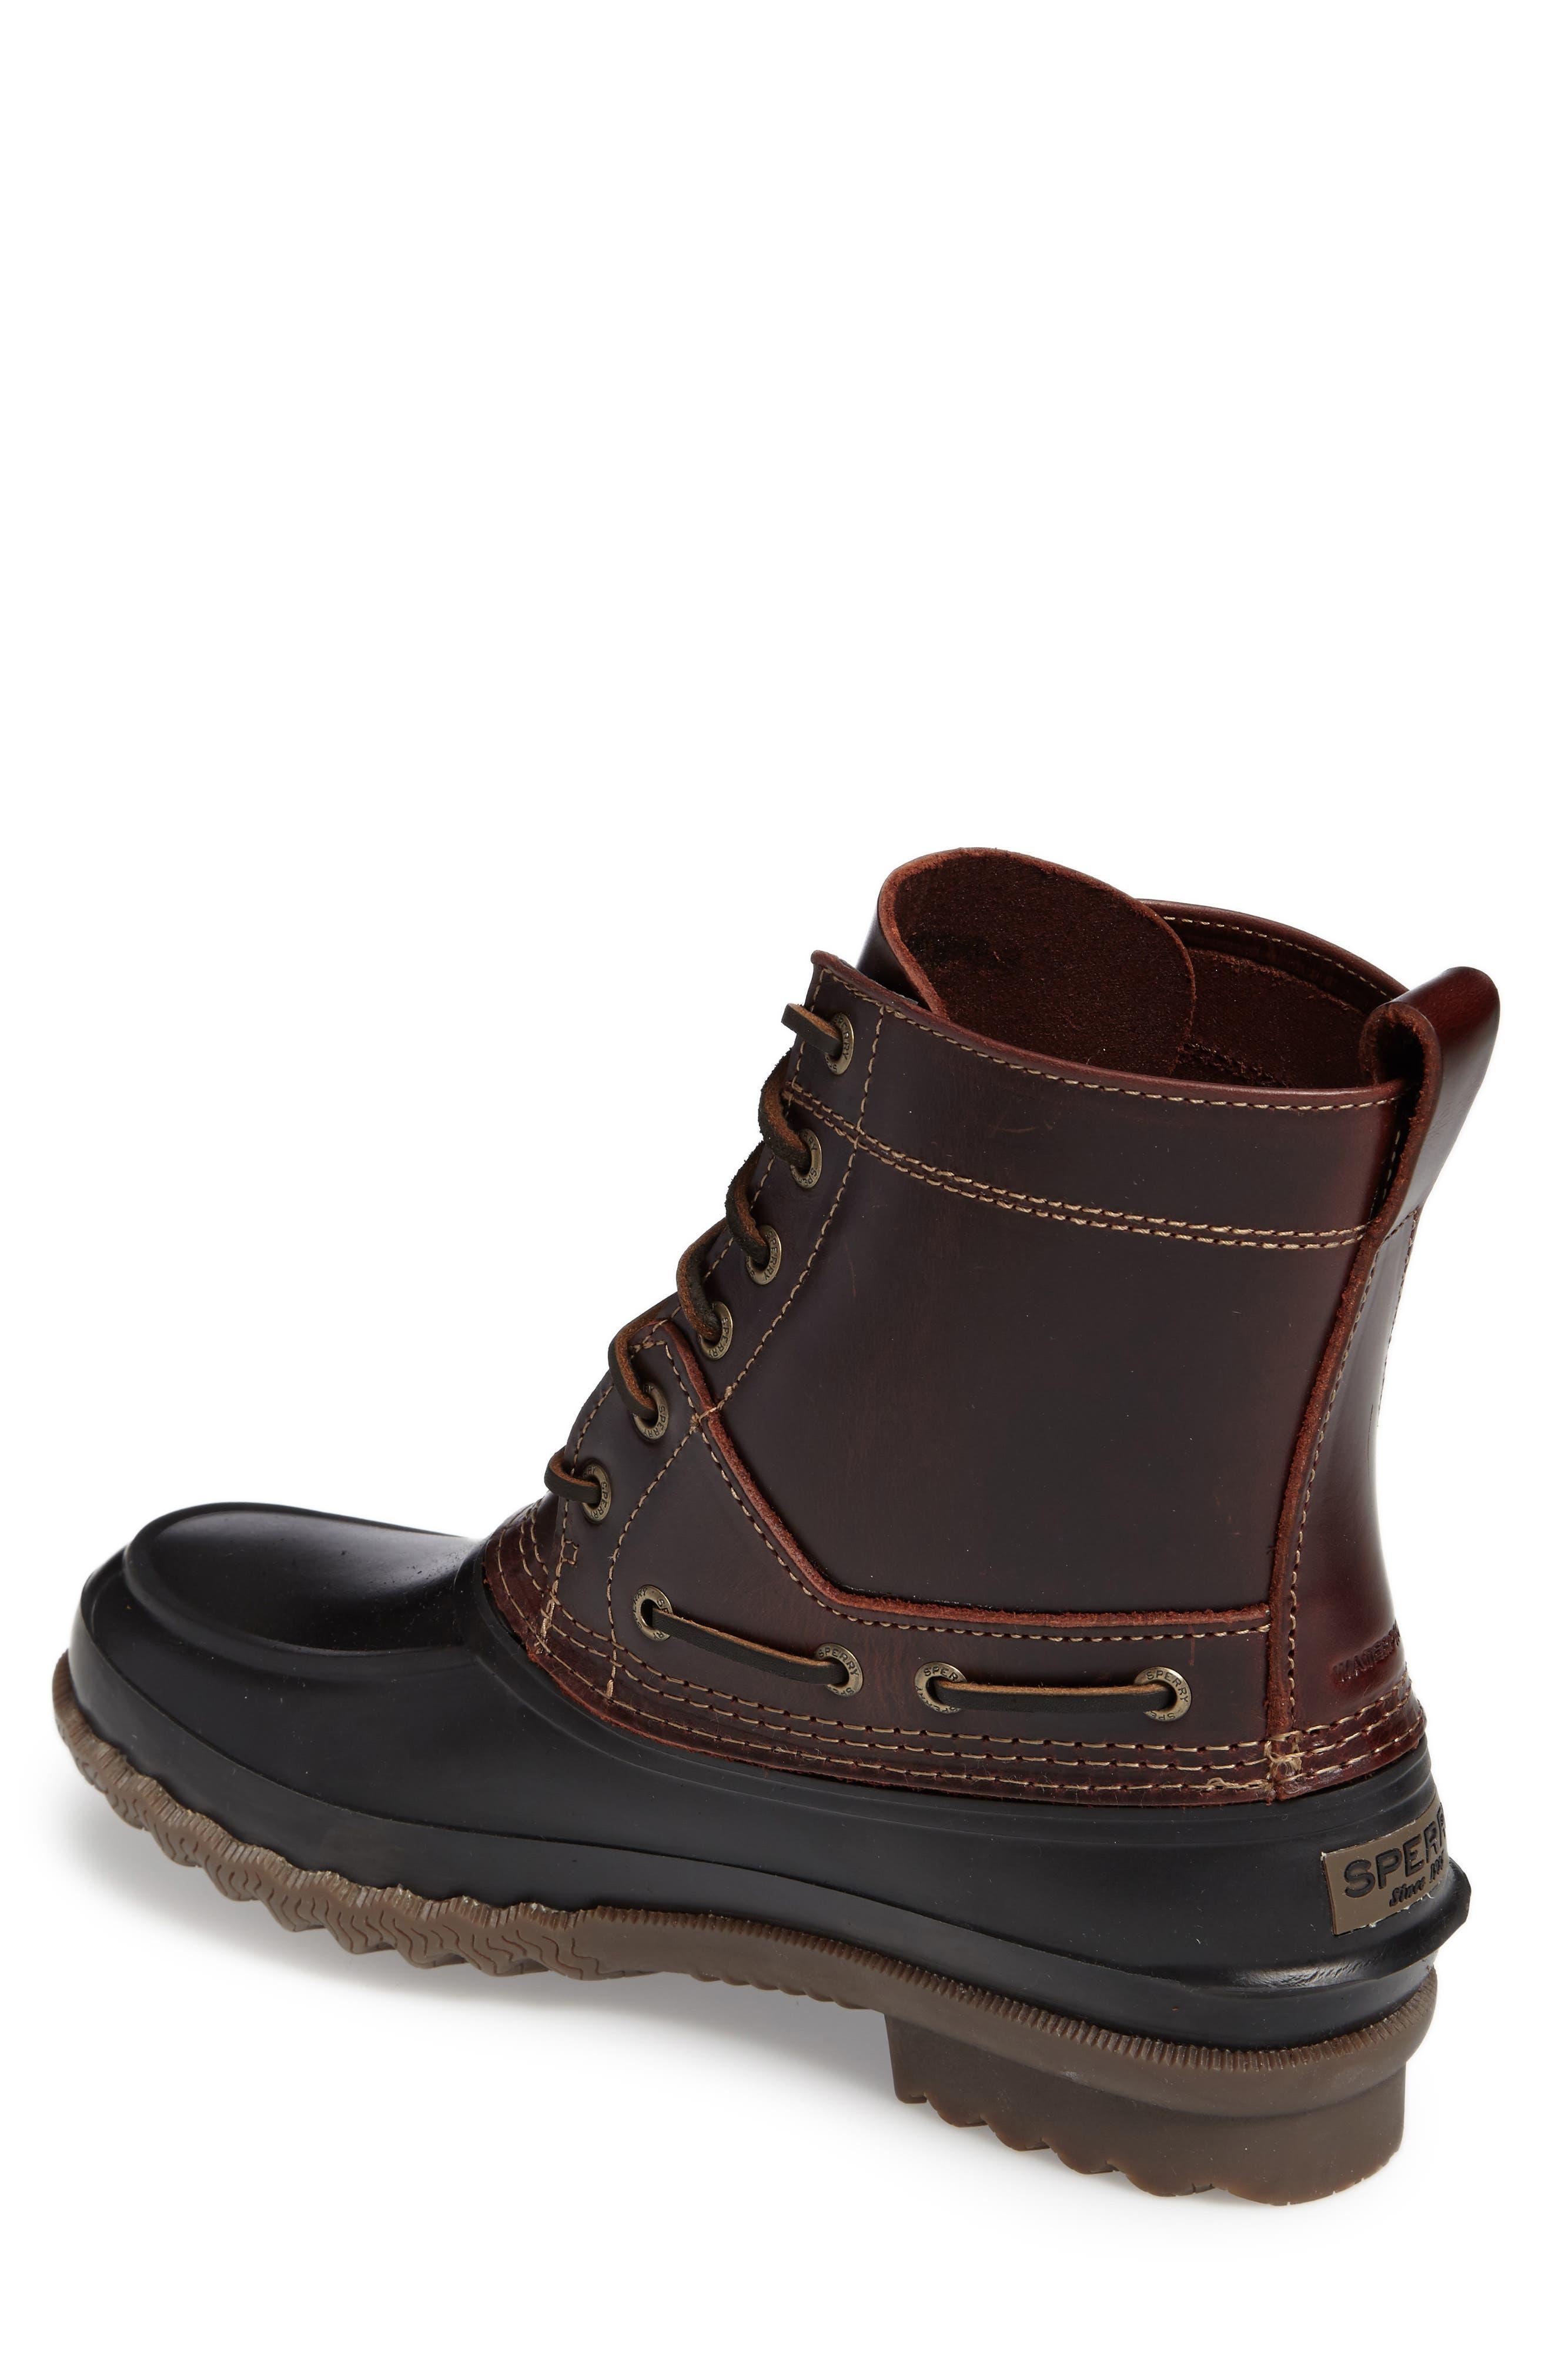 'Decoy' Waterproof Boot,                             Alternate thumbnail 2, color,                             002